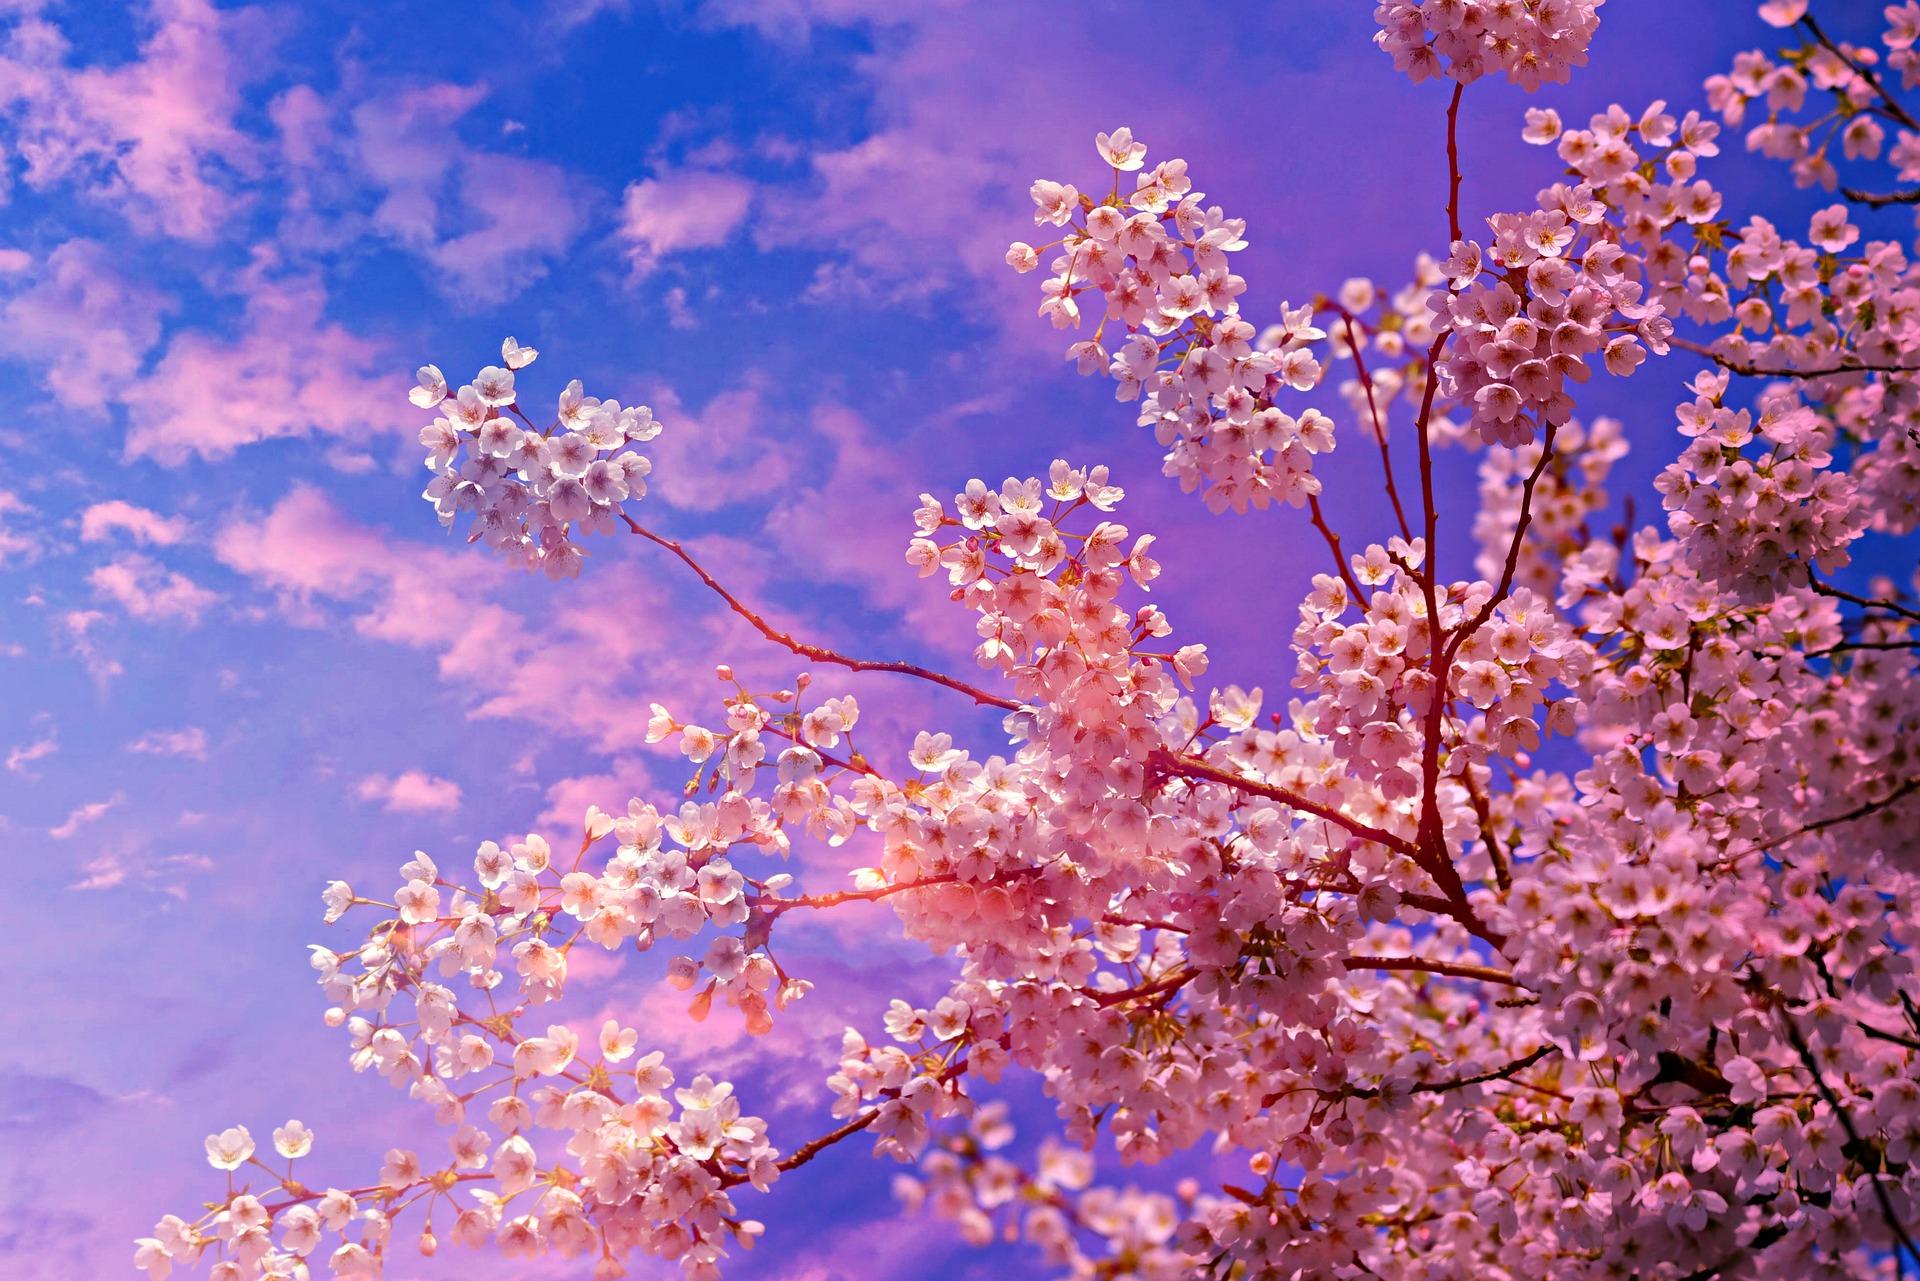 cherry-blossom-Fatherheart-France